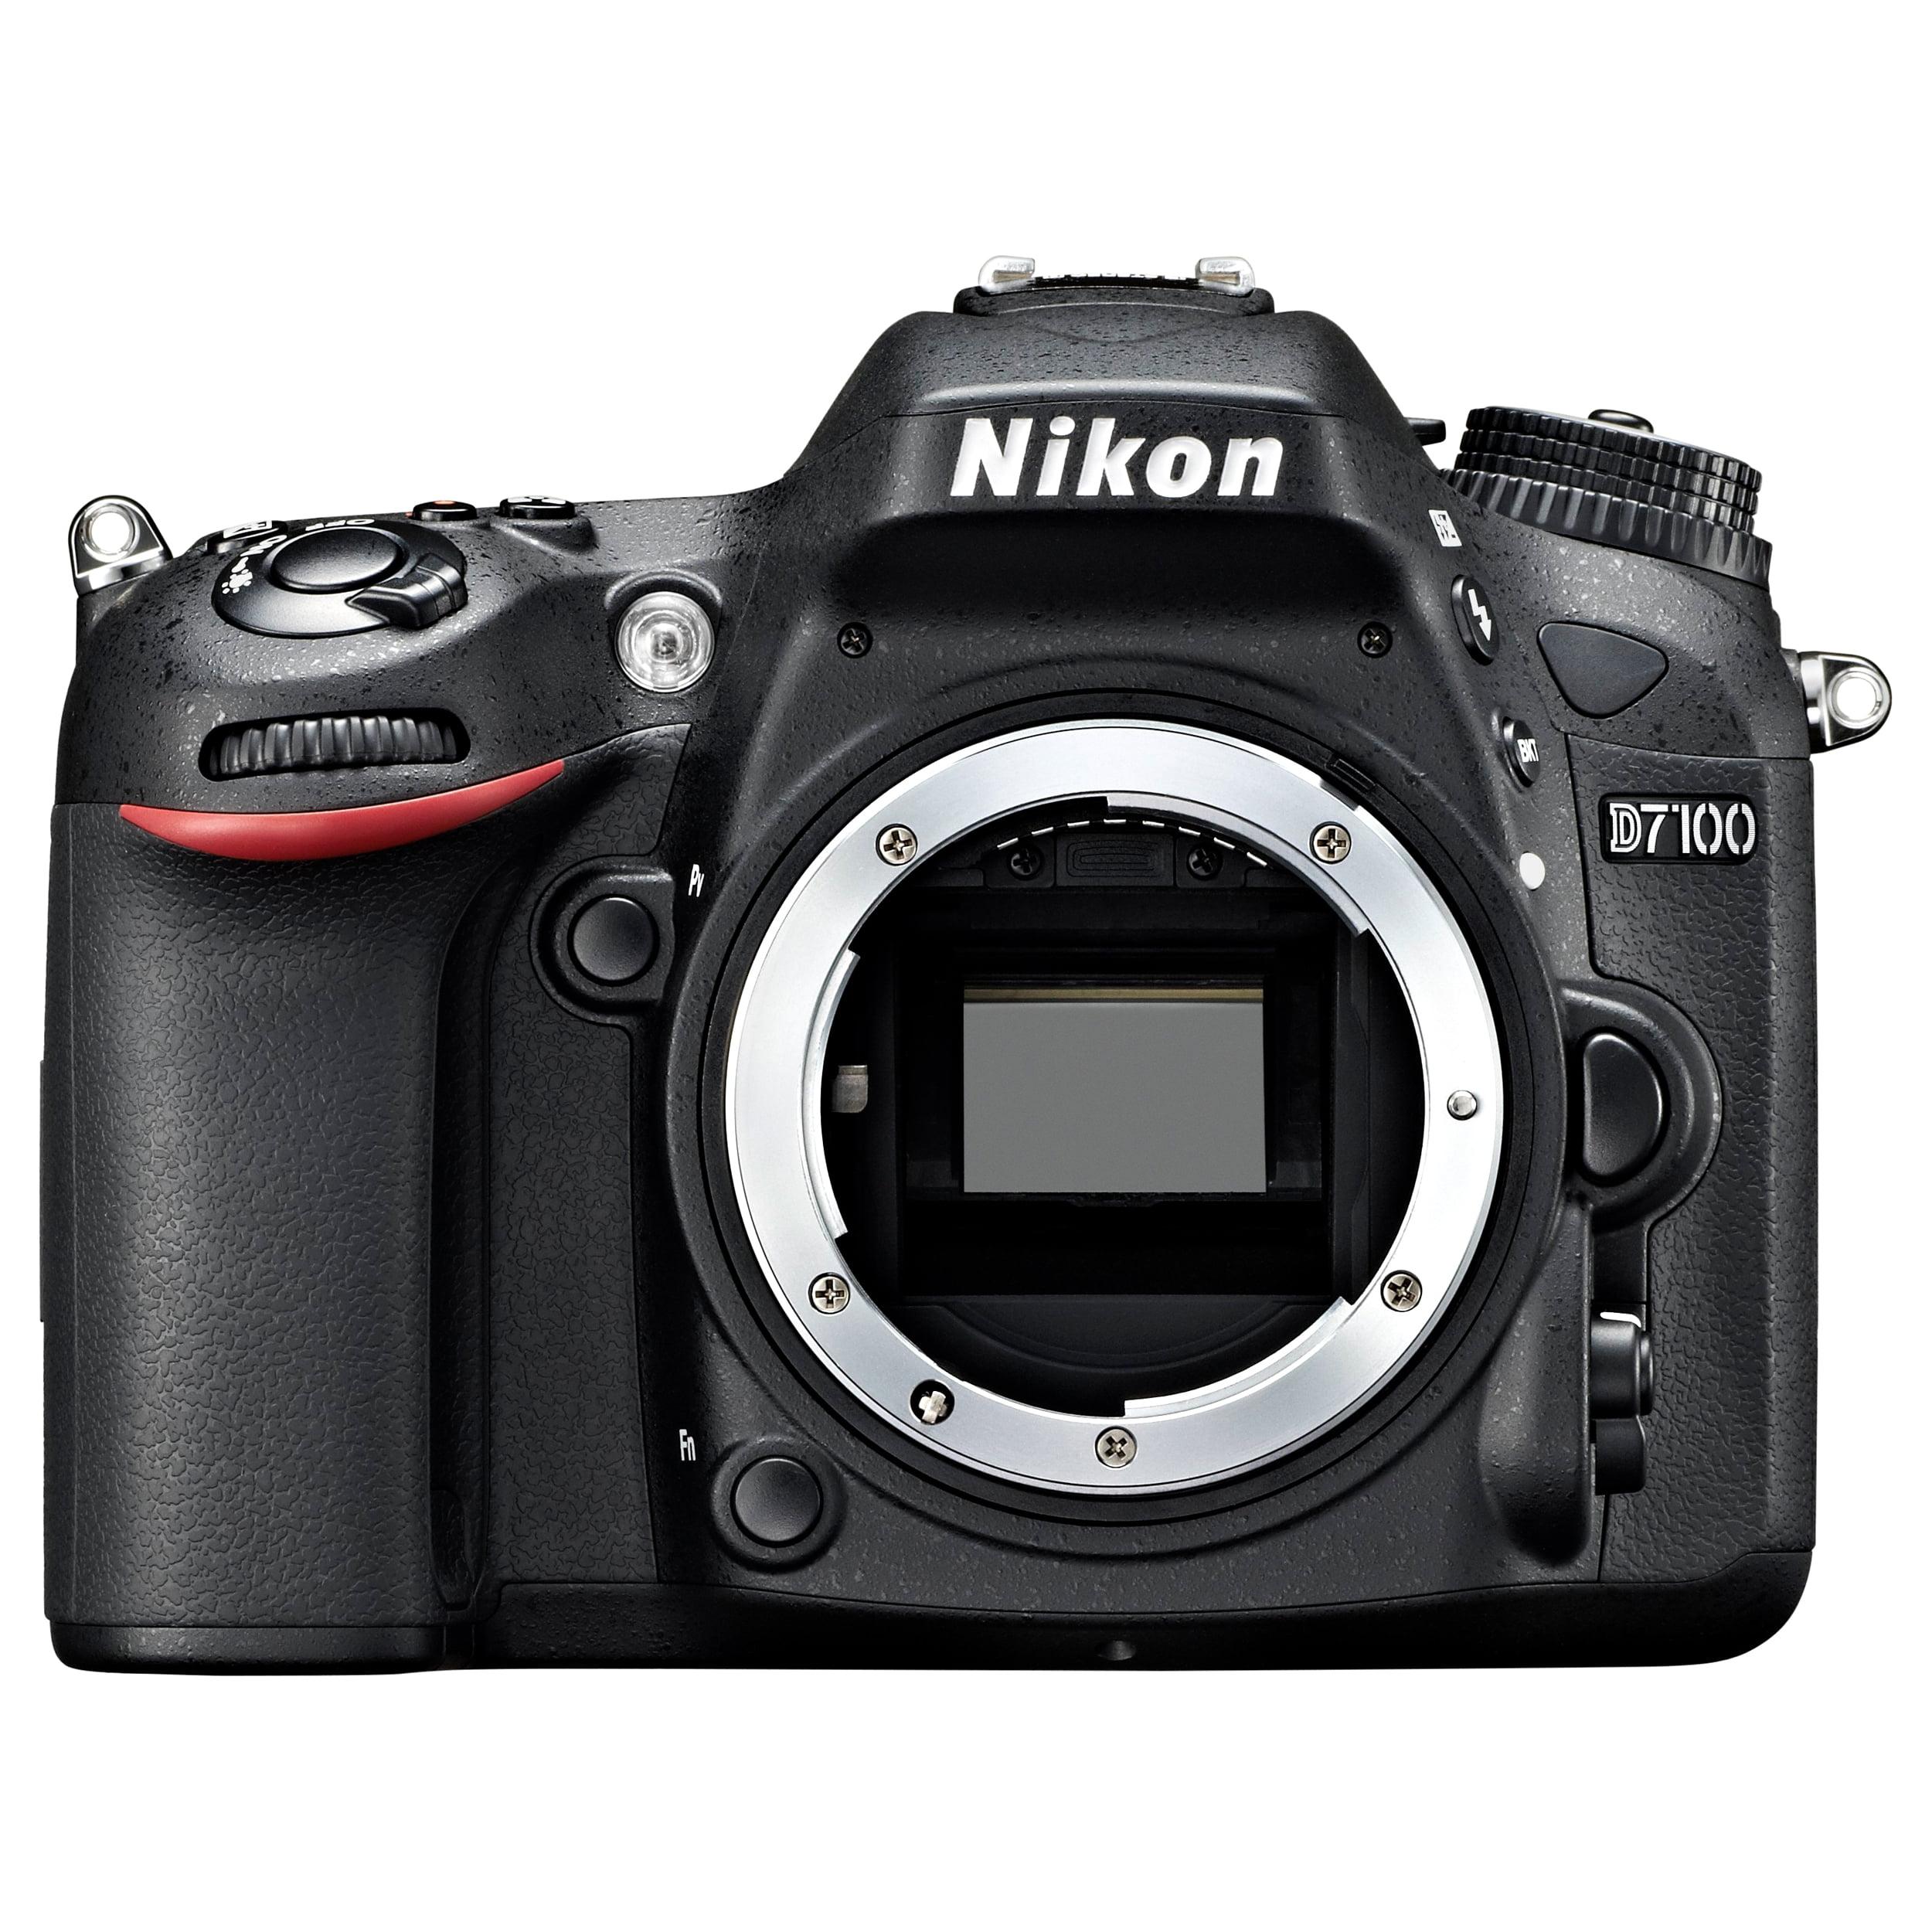 "Nikon D7100 24.1 Megapixel Digital SLR Camera Body Only - Black - 3.2"" LCD - 16:9 - 6000 x 4000 Image - 1920 x 1080 Video - HDMI - PictBridge - HD Movie Mode"